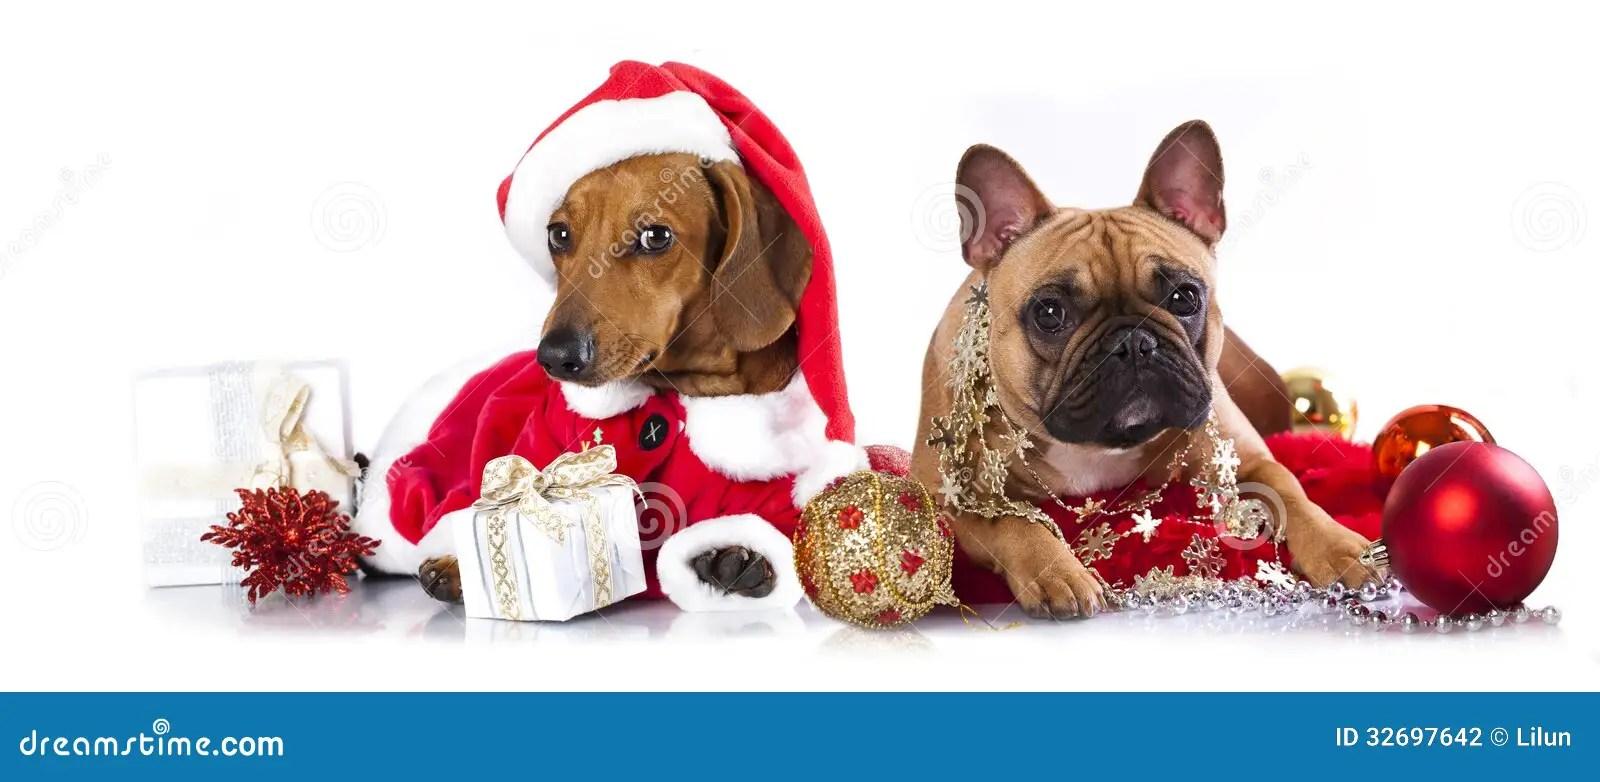 Red Animal Print Wallpaper Dogs A Santa Hat Stock Photo Image Of Friend Pedigree